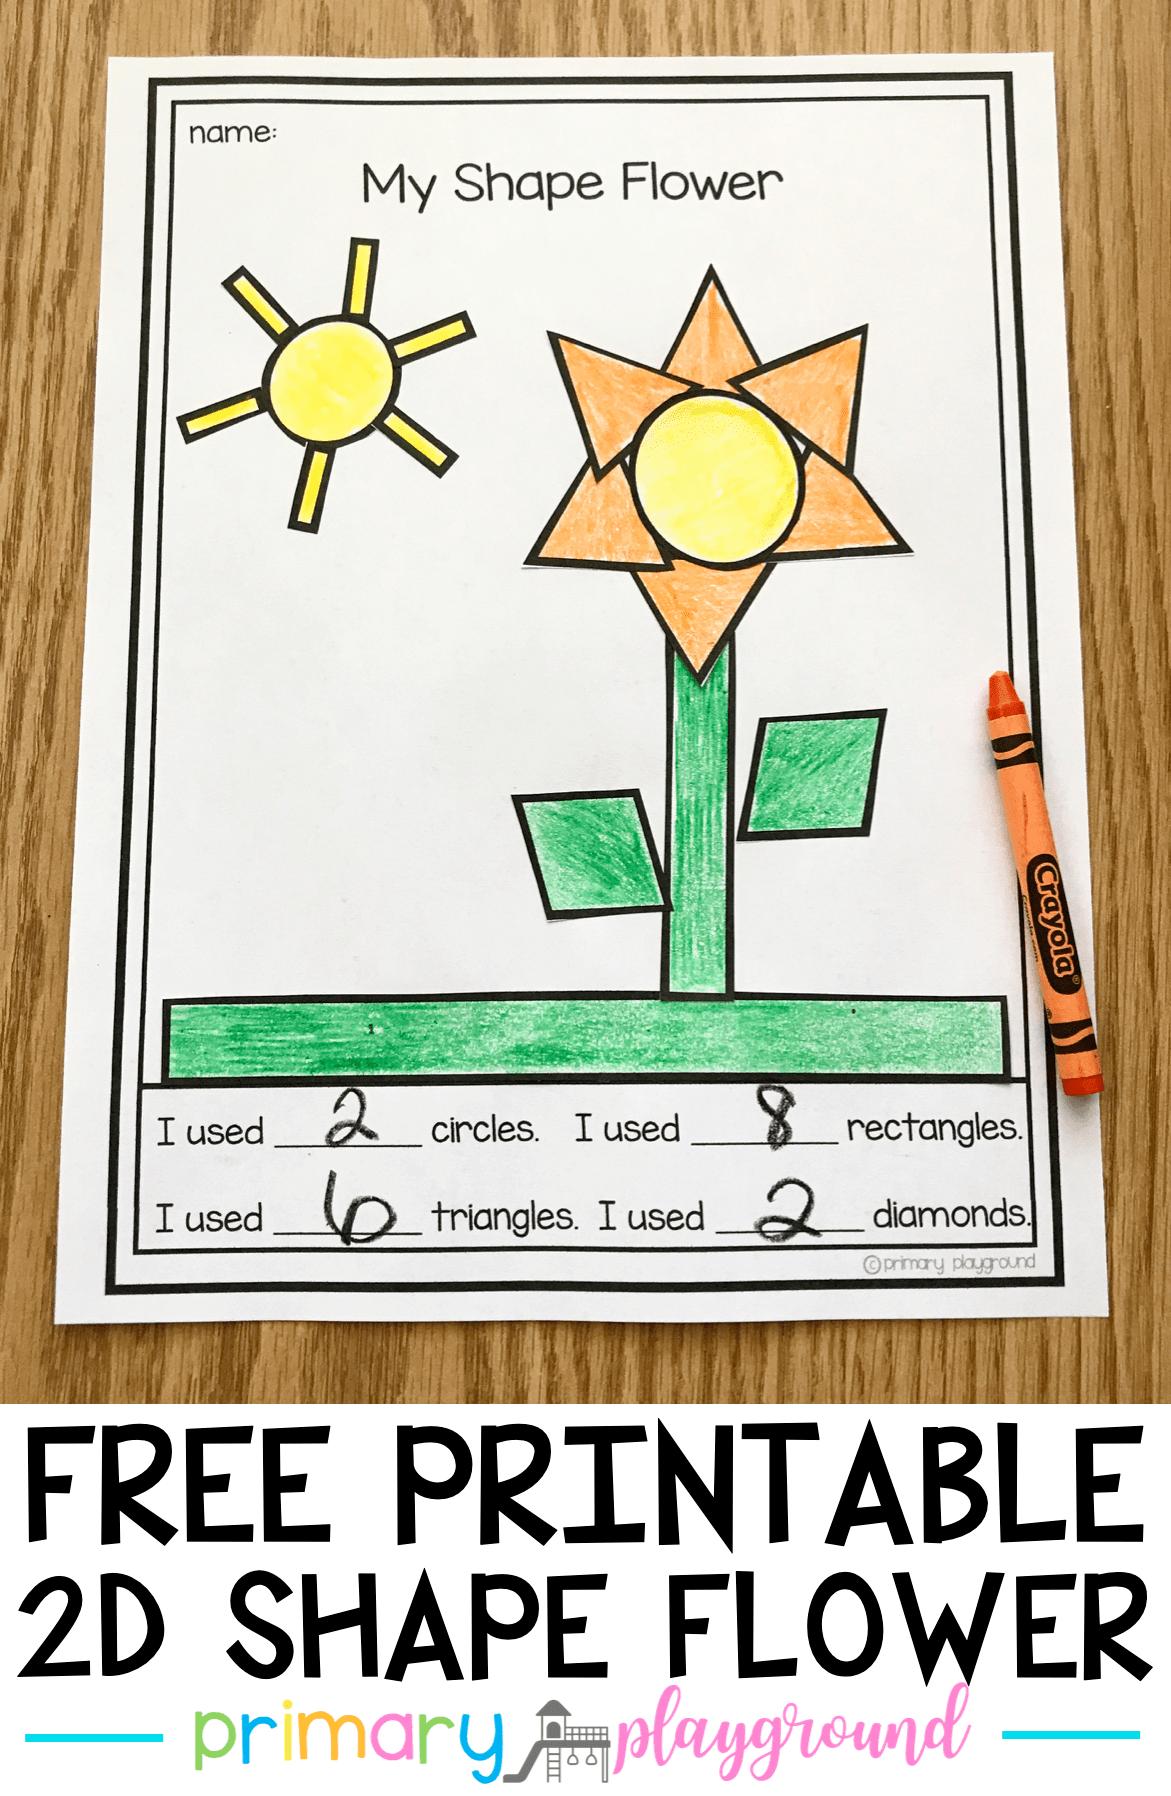 Free Printable 2d Shape Flower